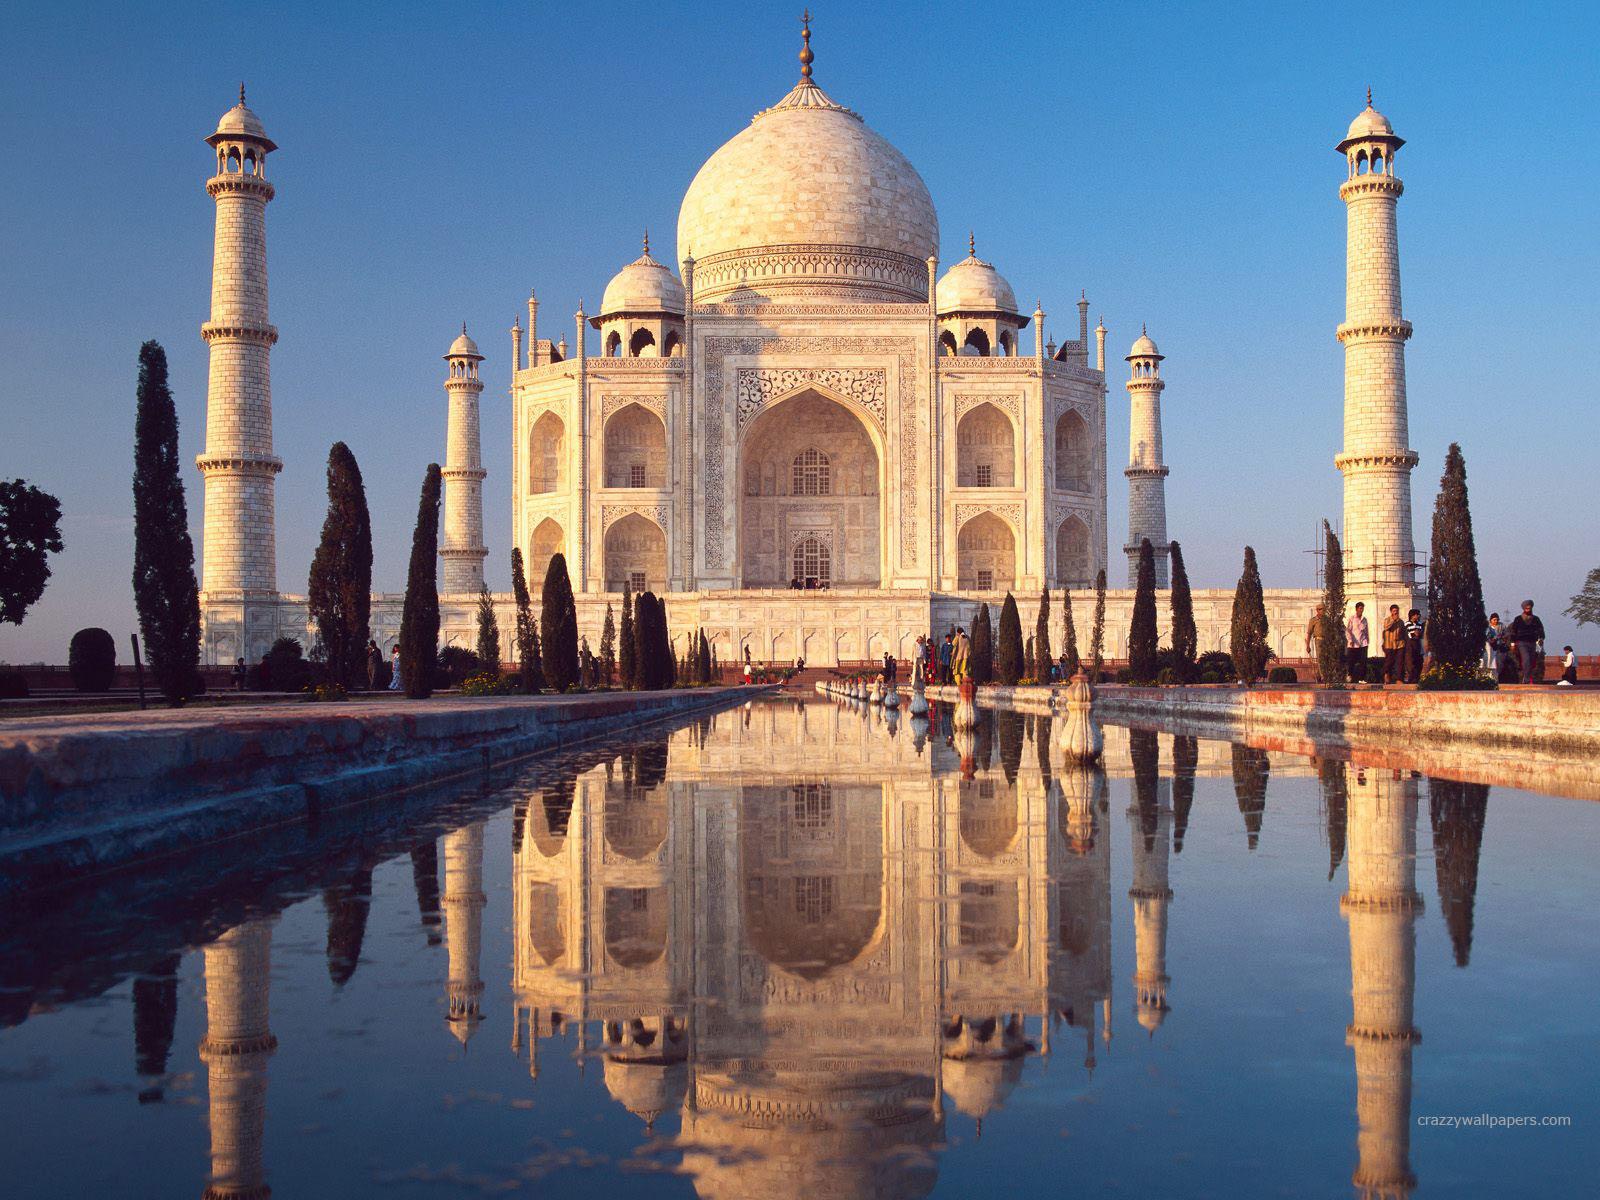 Taj Mahal Agra India HD Wallpapers HD Wallpapers 1600x1200